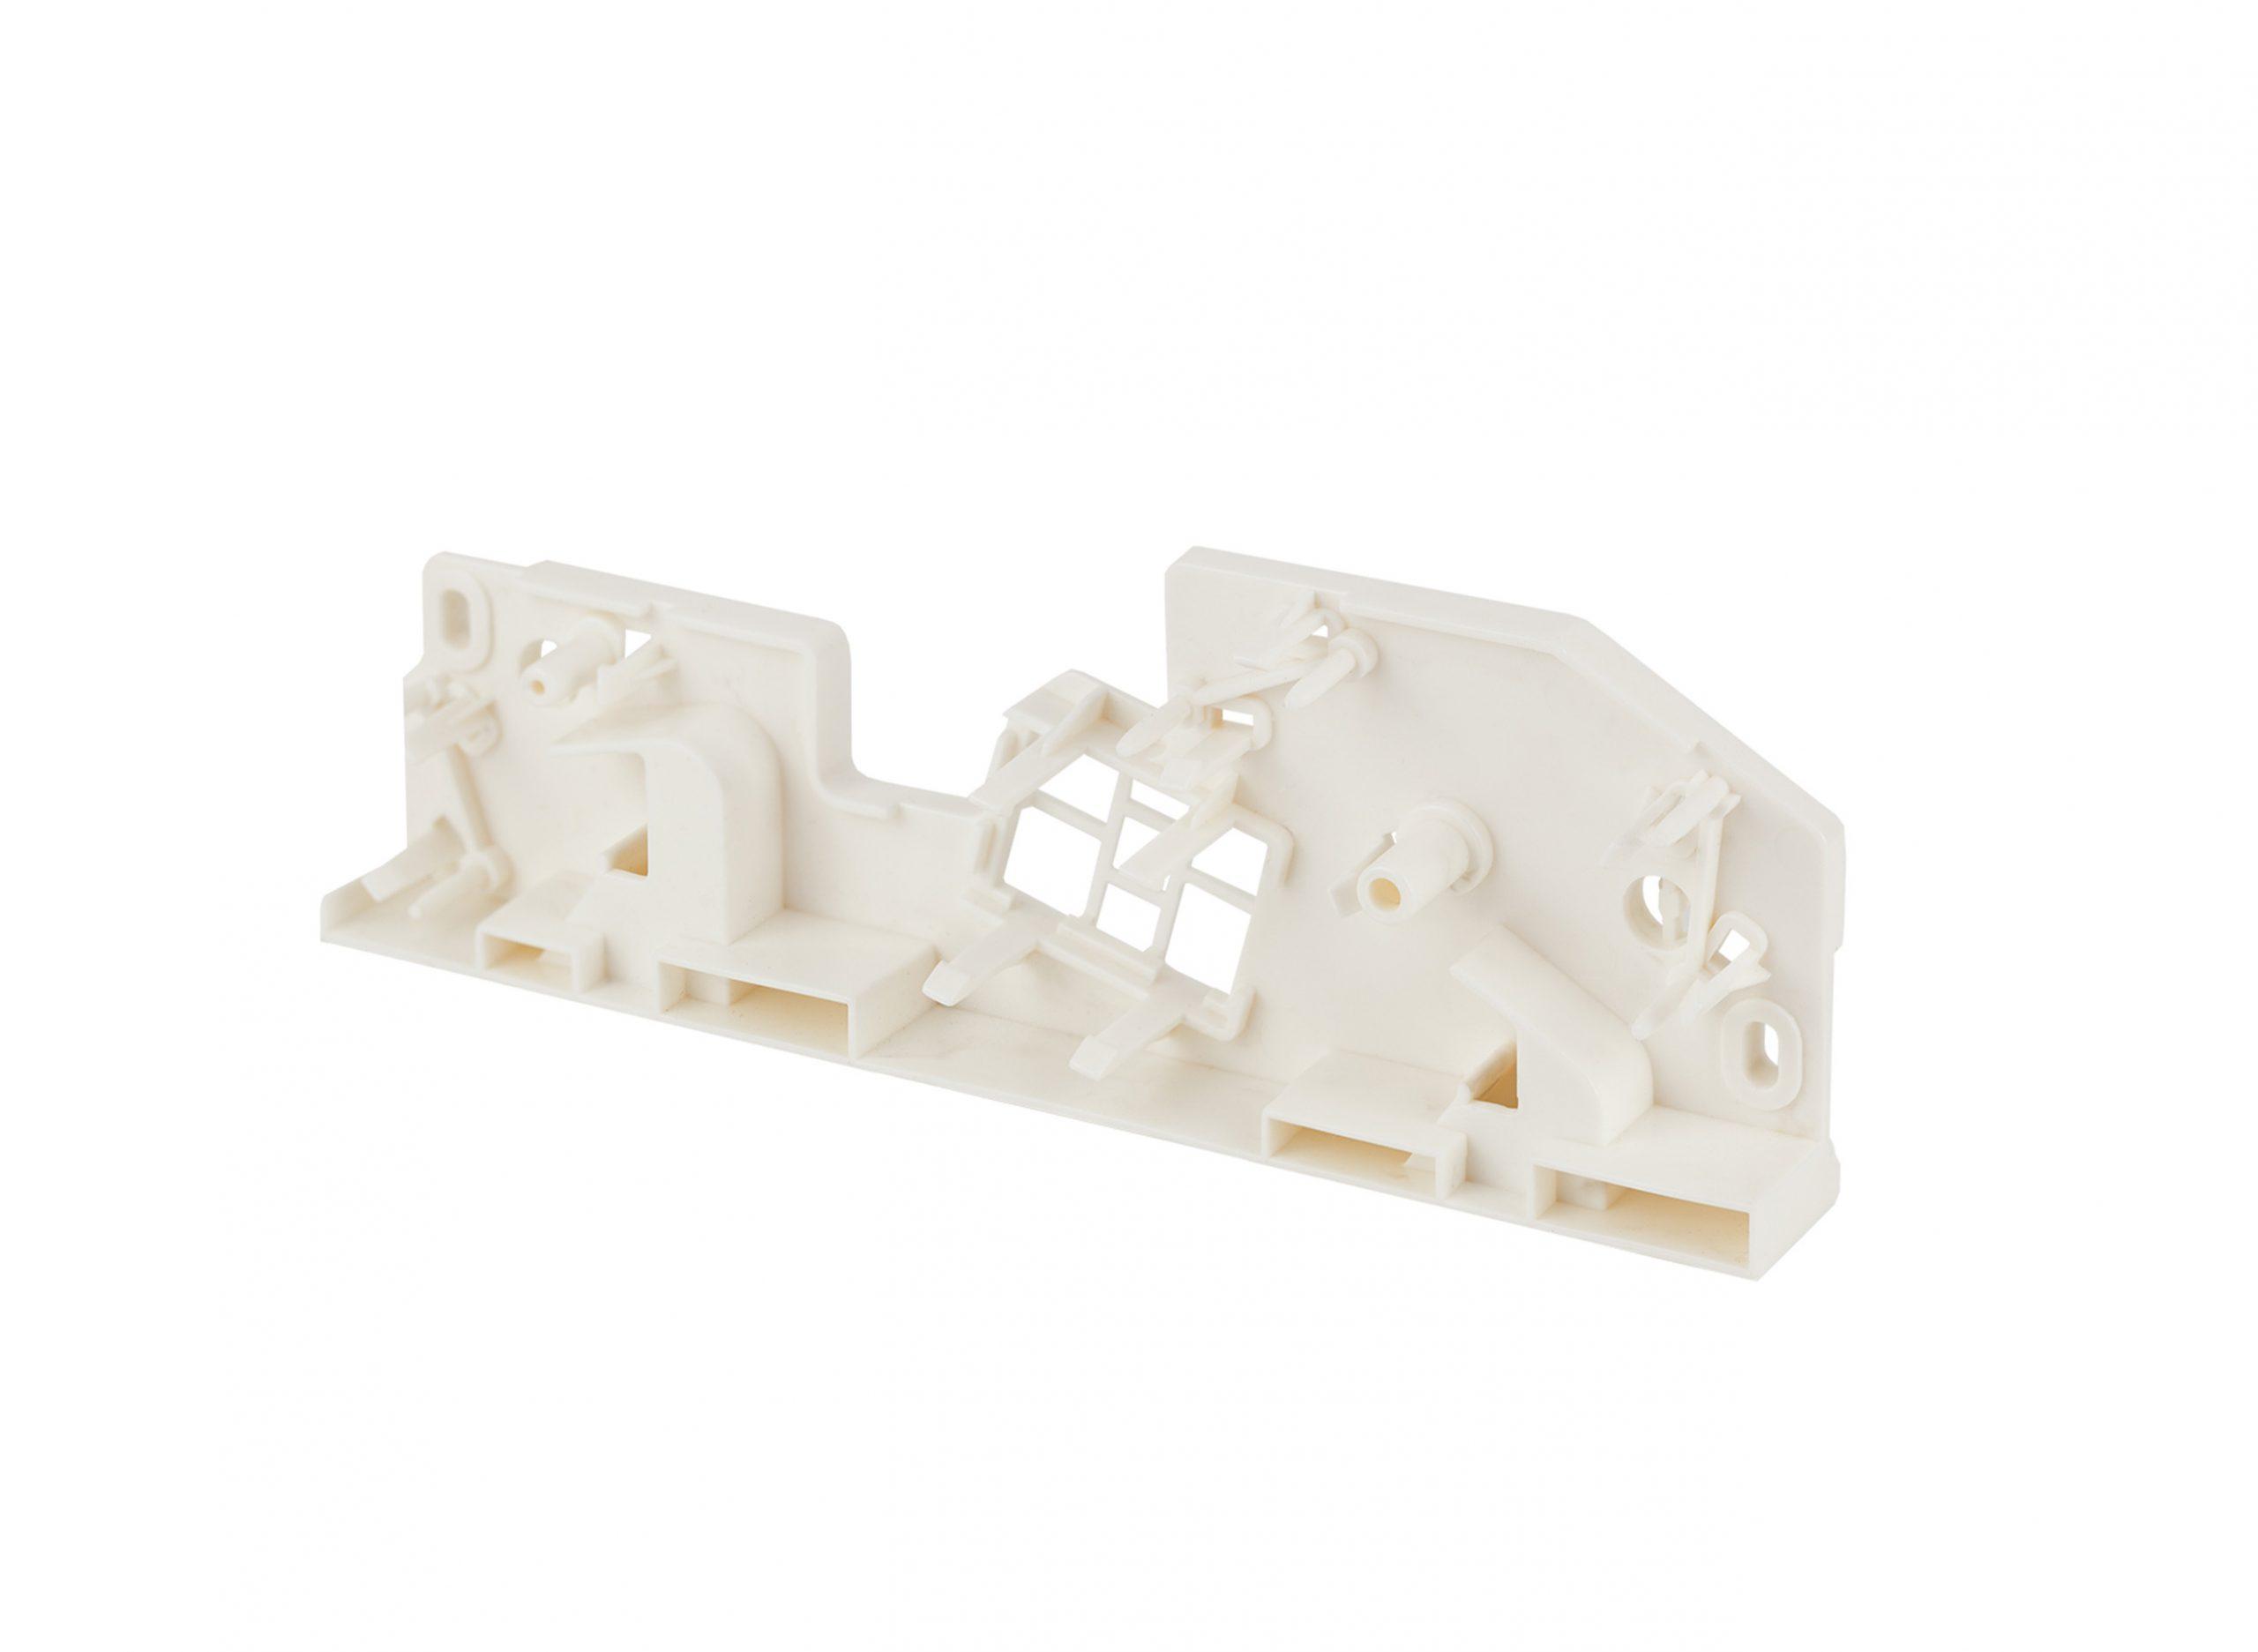 prifer-mold__0018_prifer-mold_40_0005_prifer-mold_77_0034_prifer_plastic_25